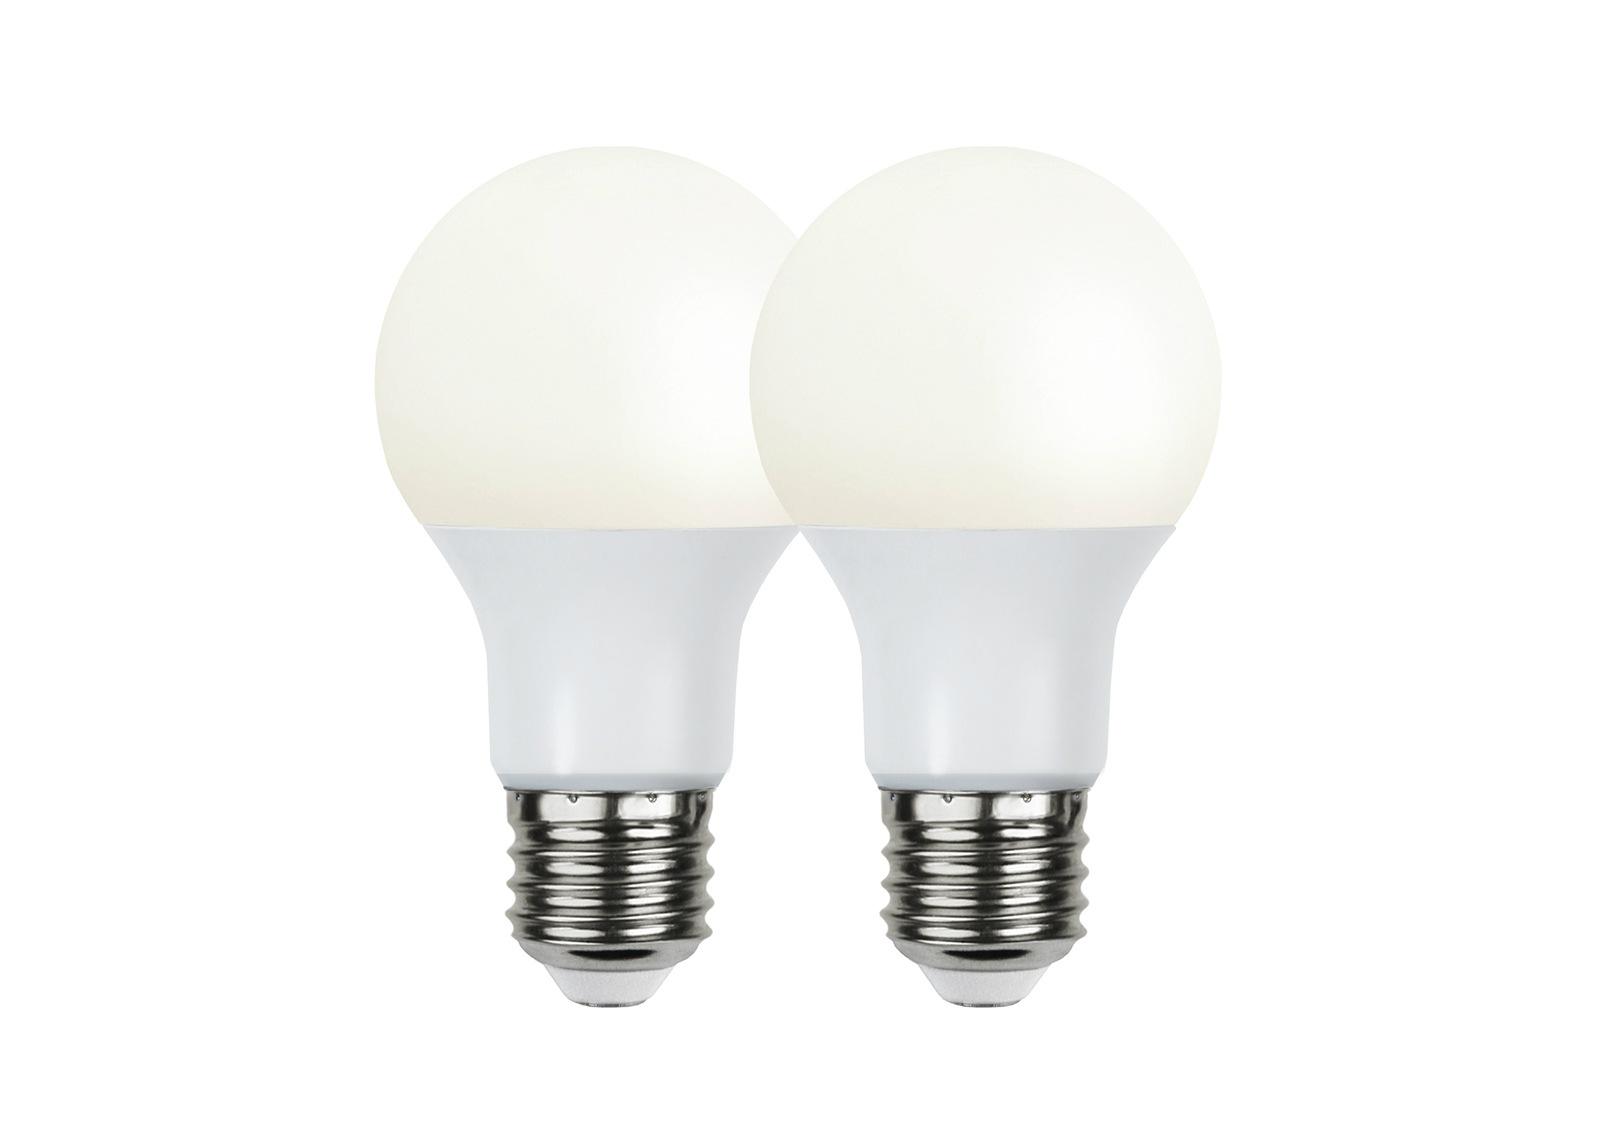 LED sähkölamppu E27 9 W (2 kpl)